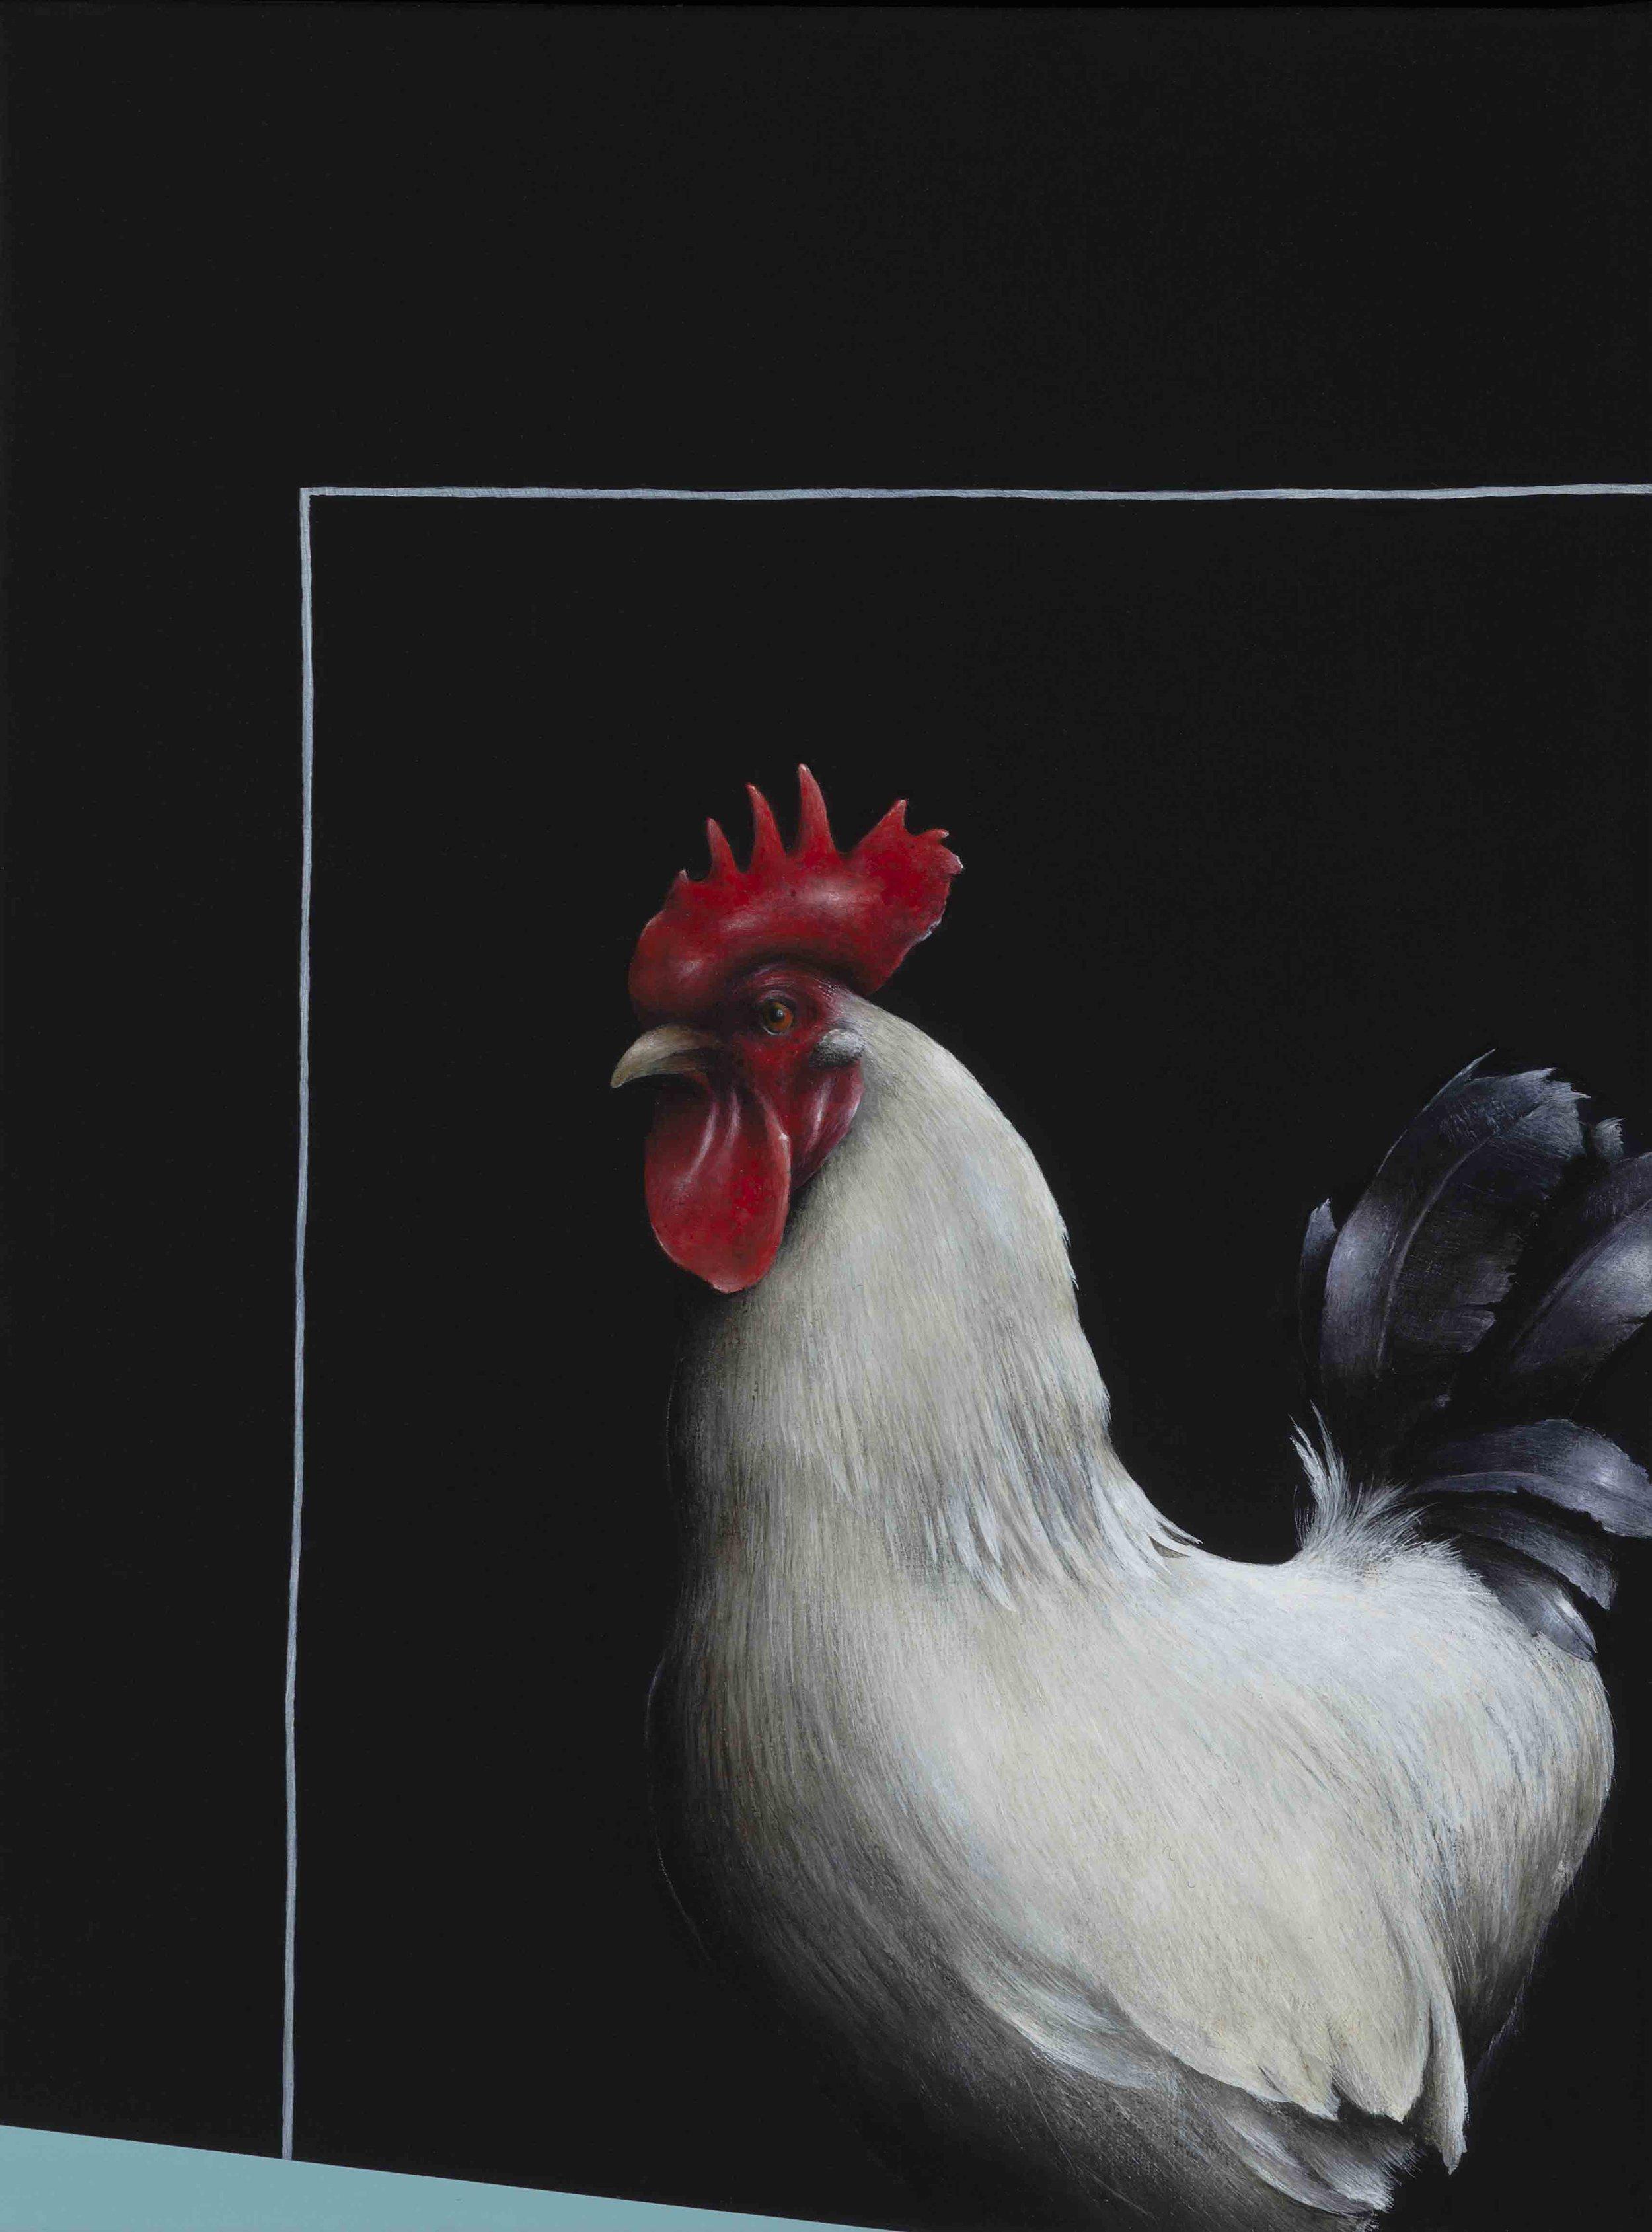 Jarek Wojcik, Enclosure 2 , 2016, acrylic on linen, 41 x 31cm